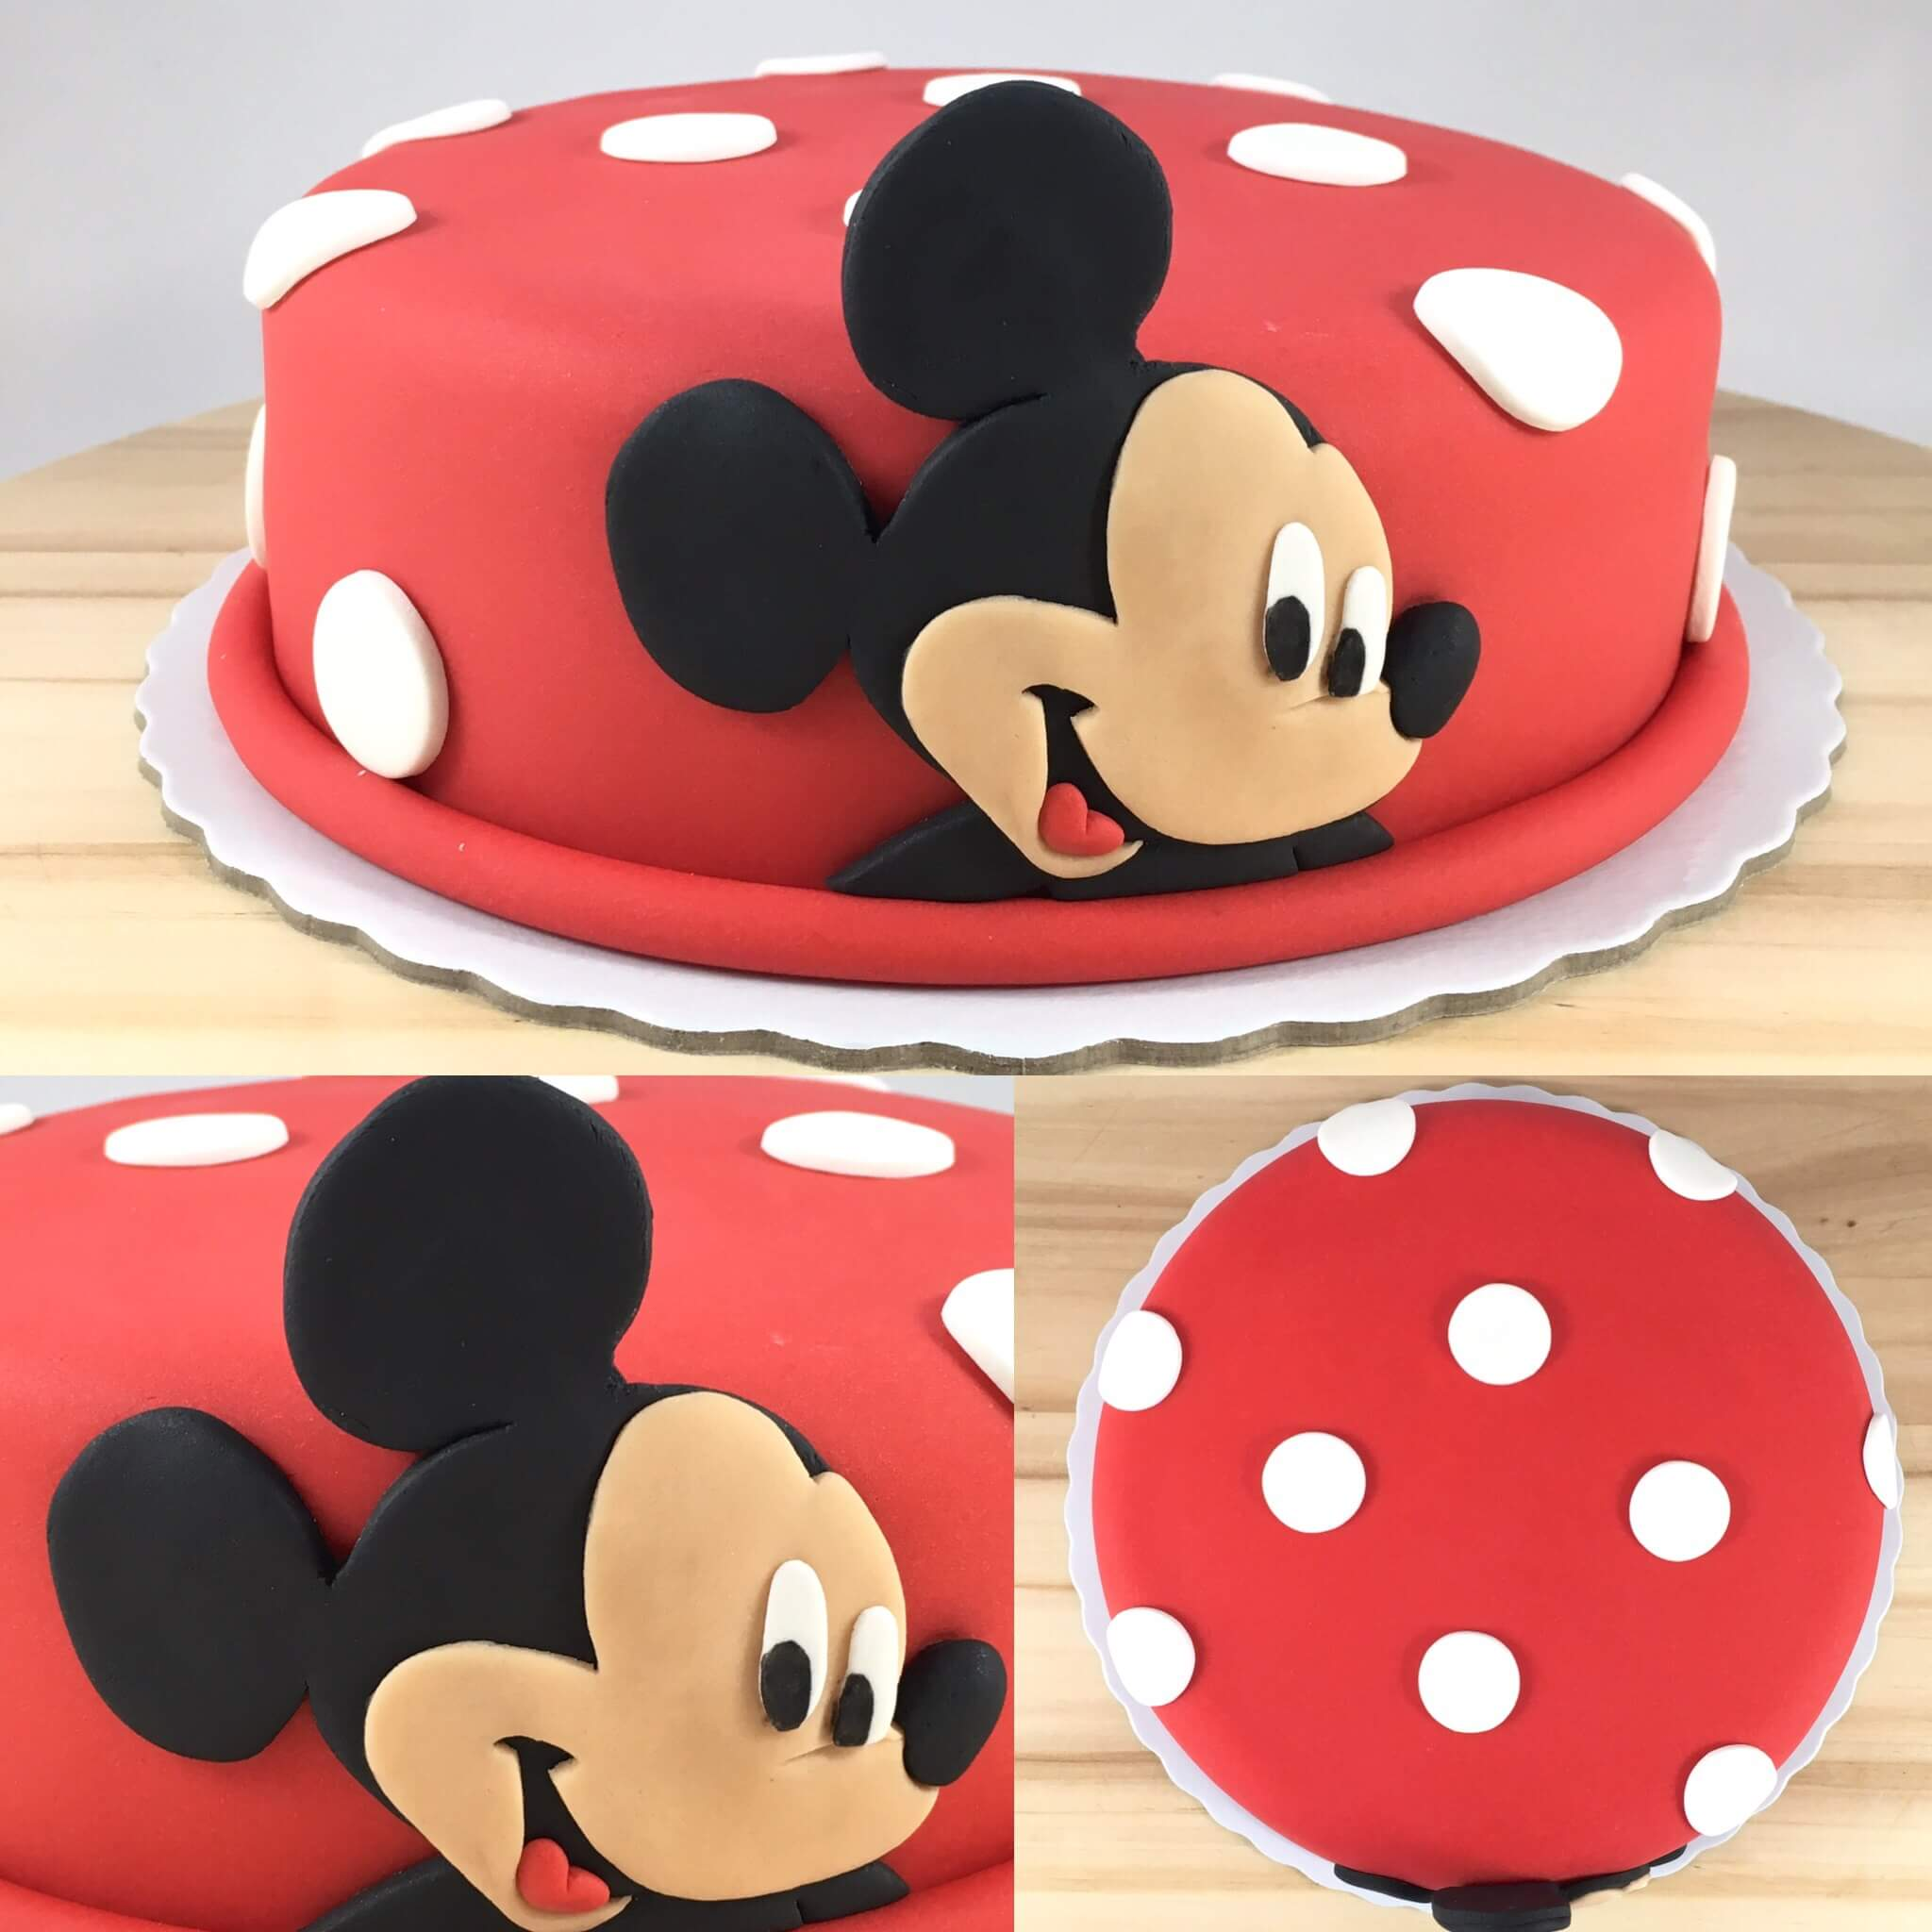 Bolo Com A Cara Do Mickey Mouse Bolo Simples E T 227 O Querido